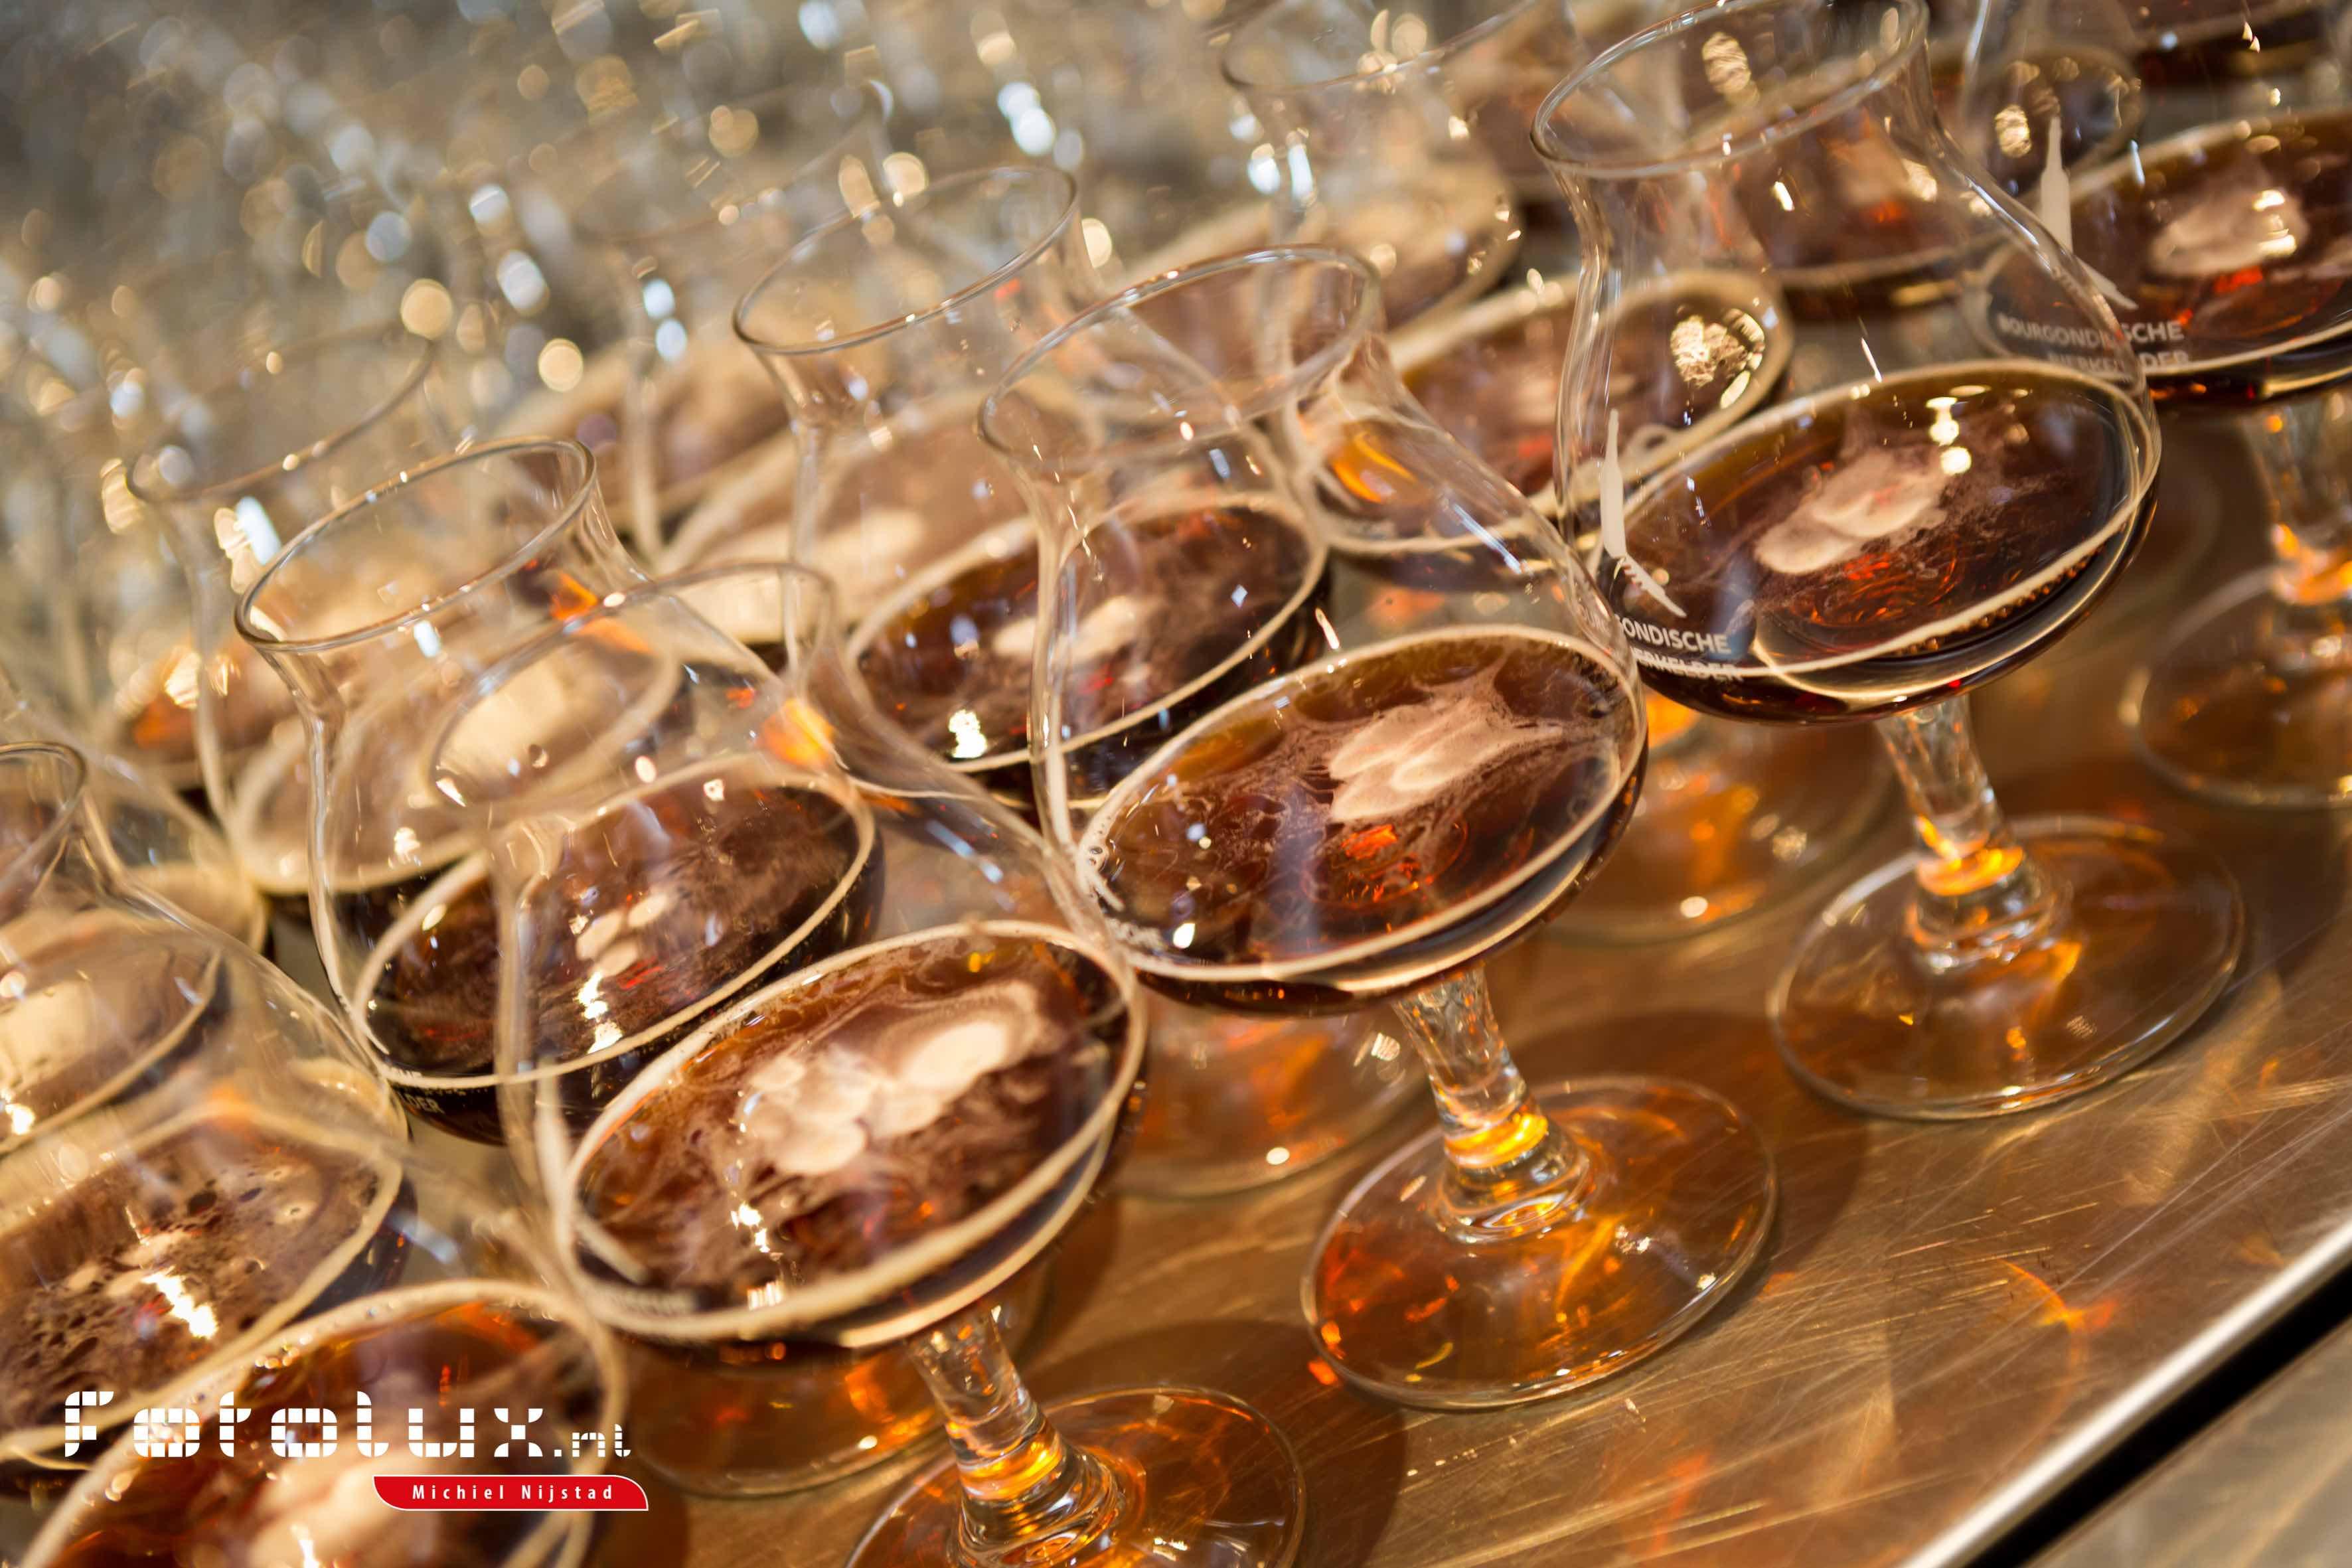 Opening Bourgondische Bierkelder